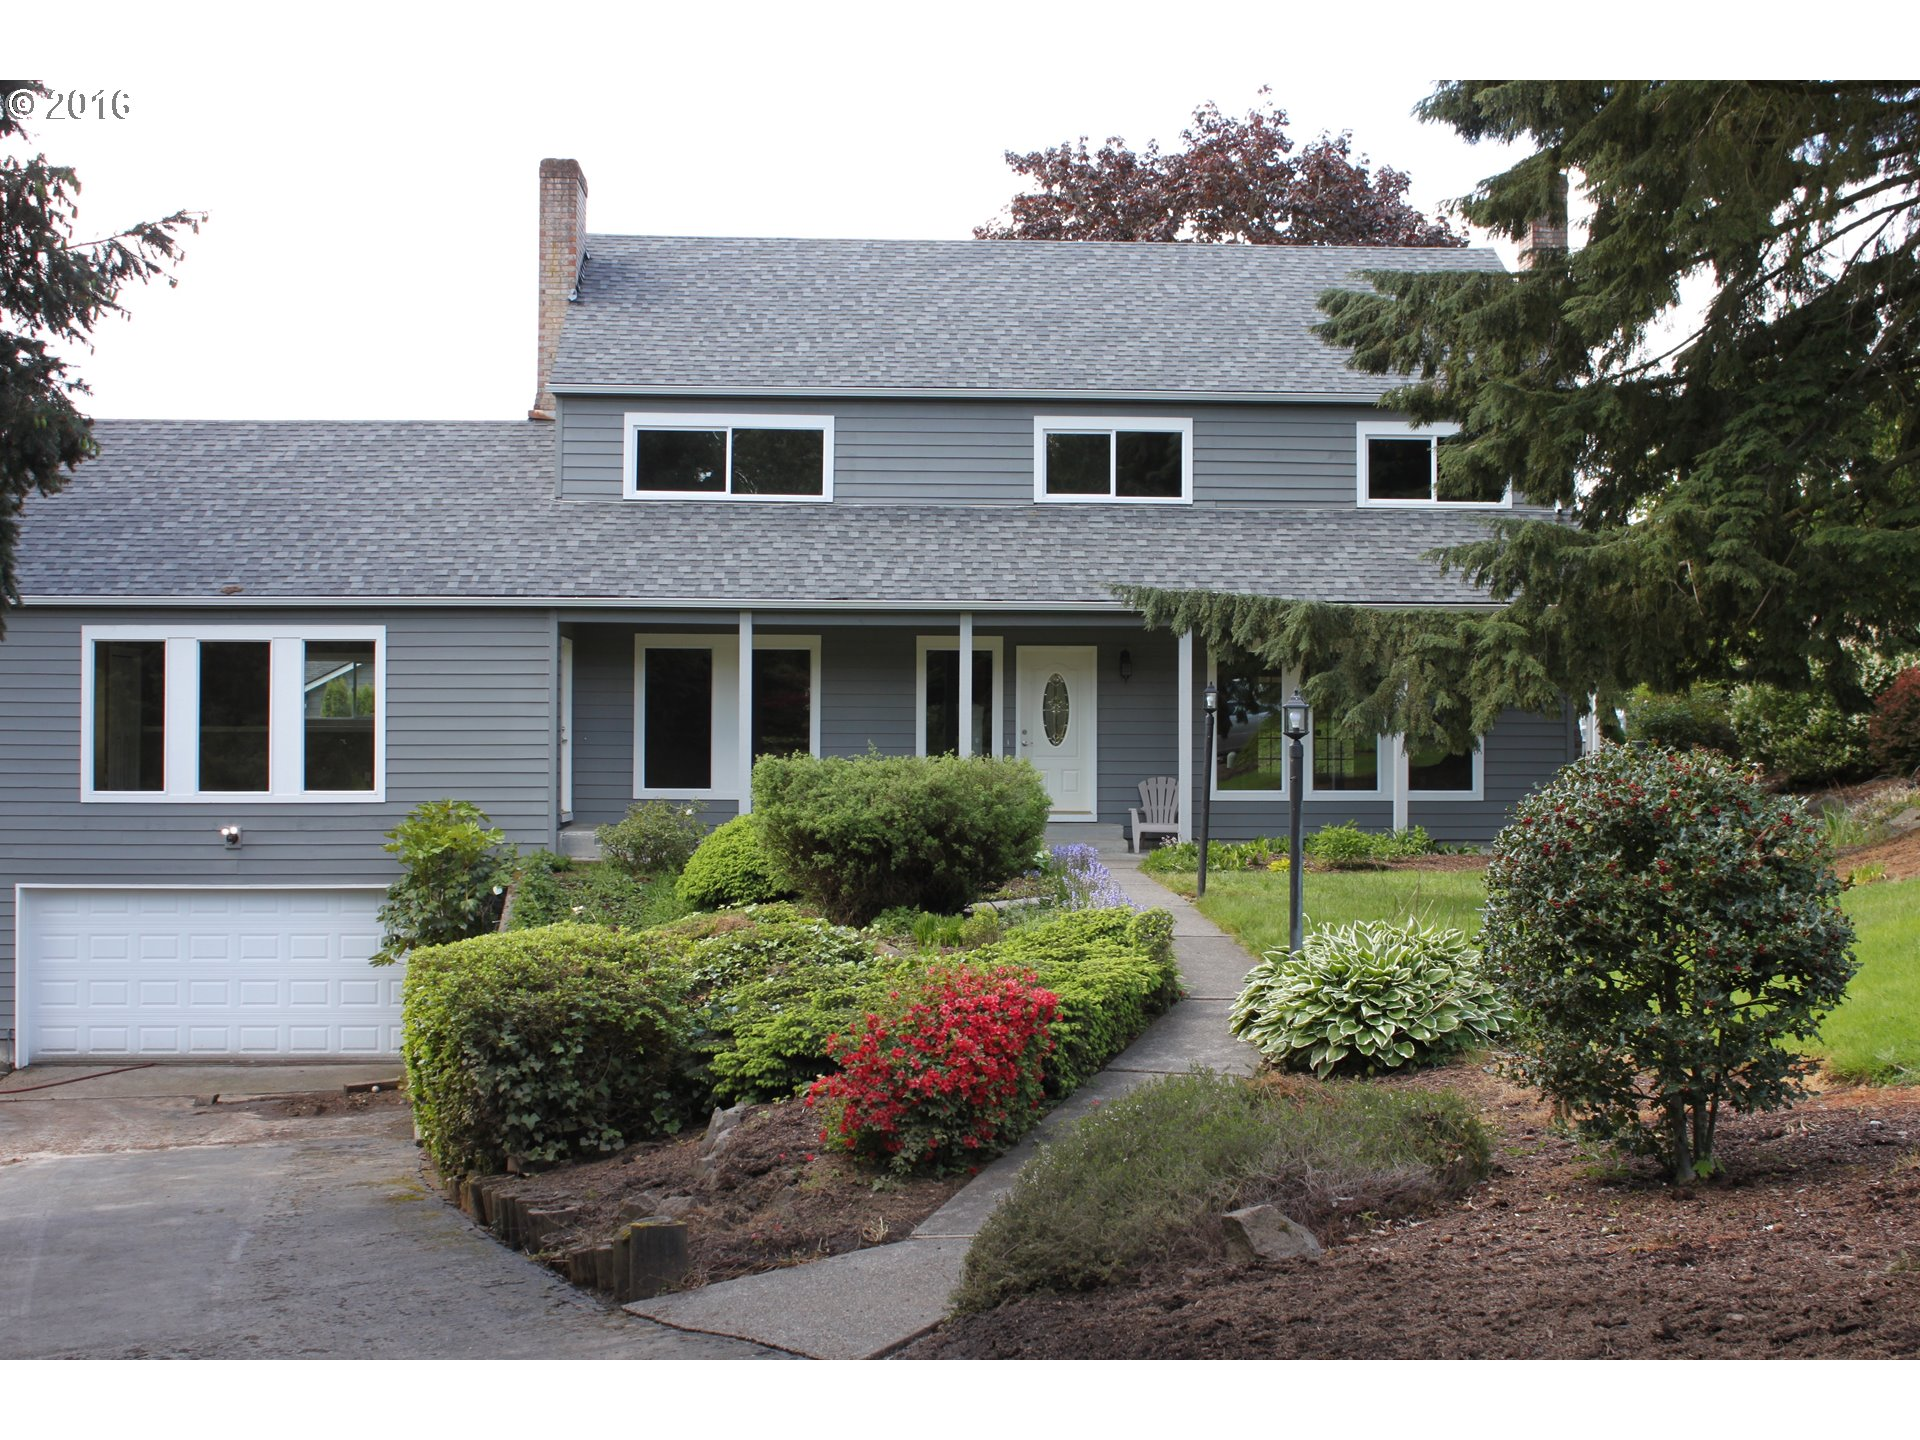 10712 NW Oxbow Ridge Dr, Vancouver, WA